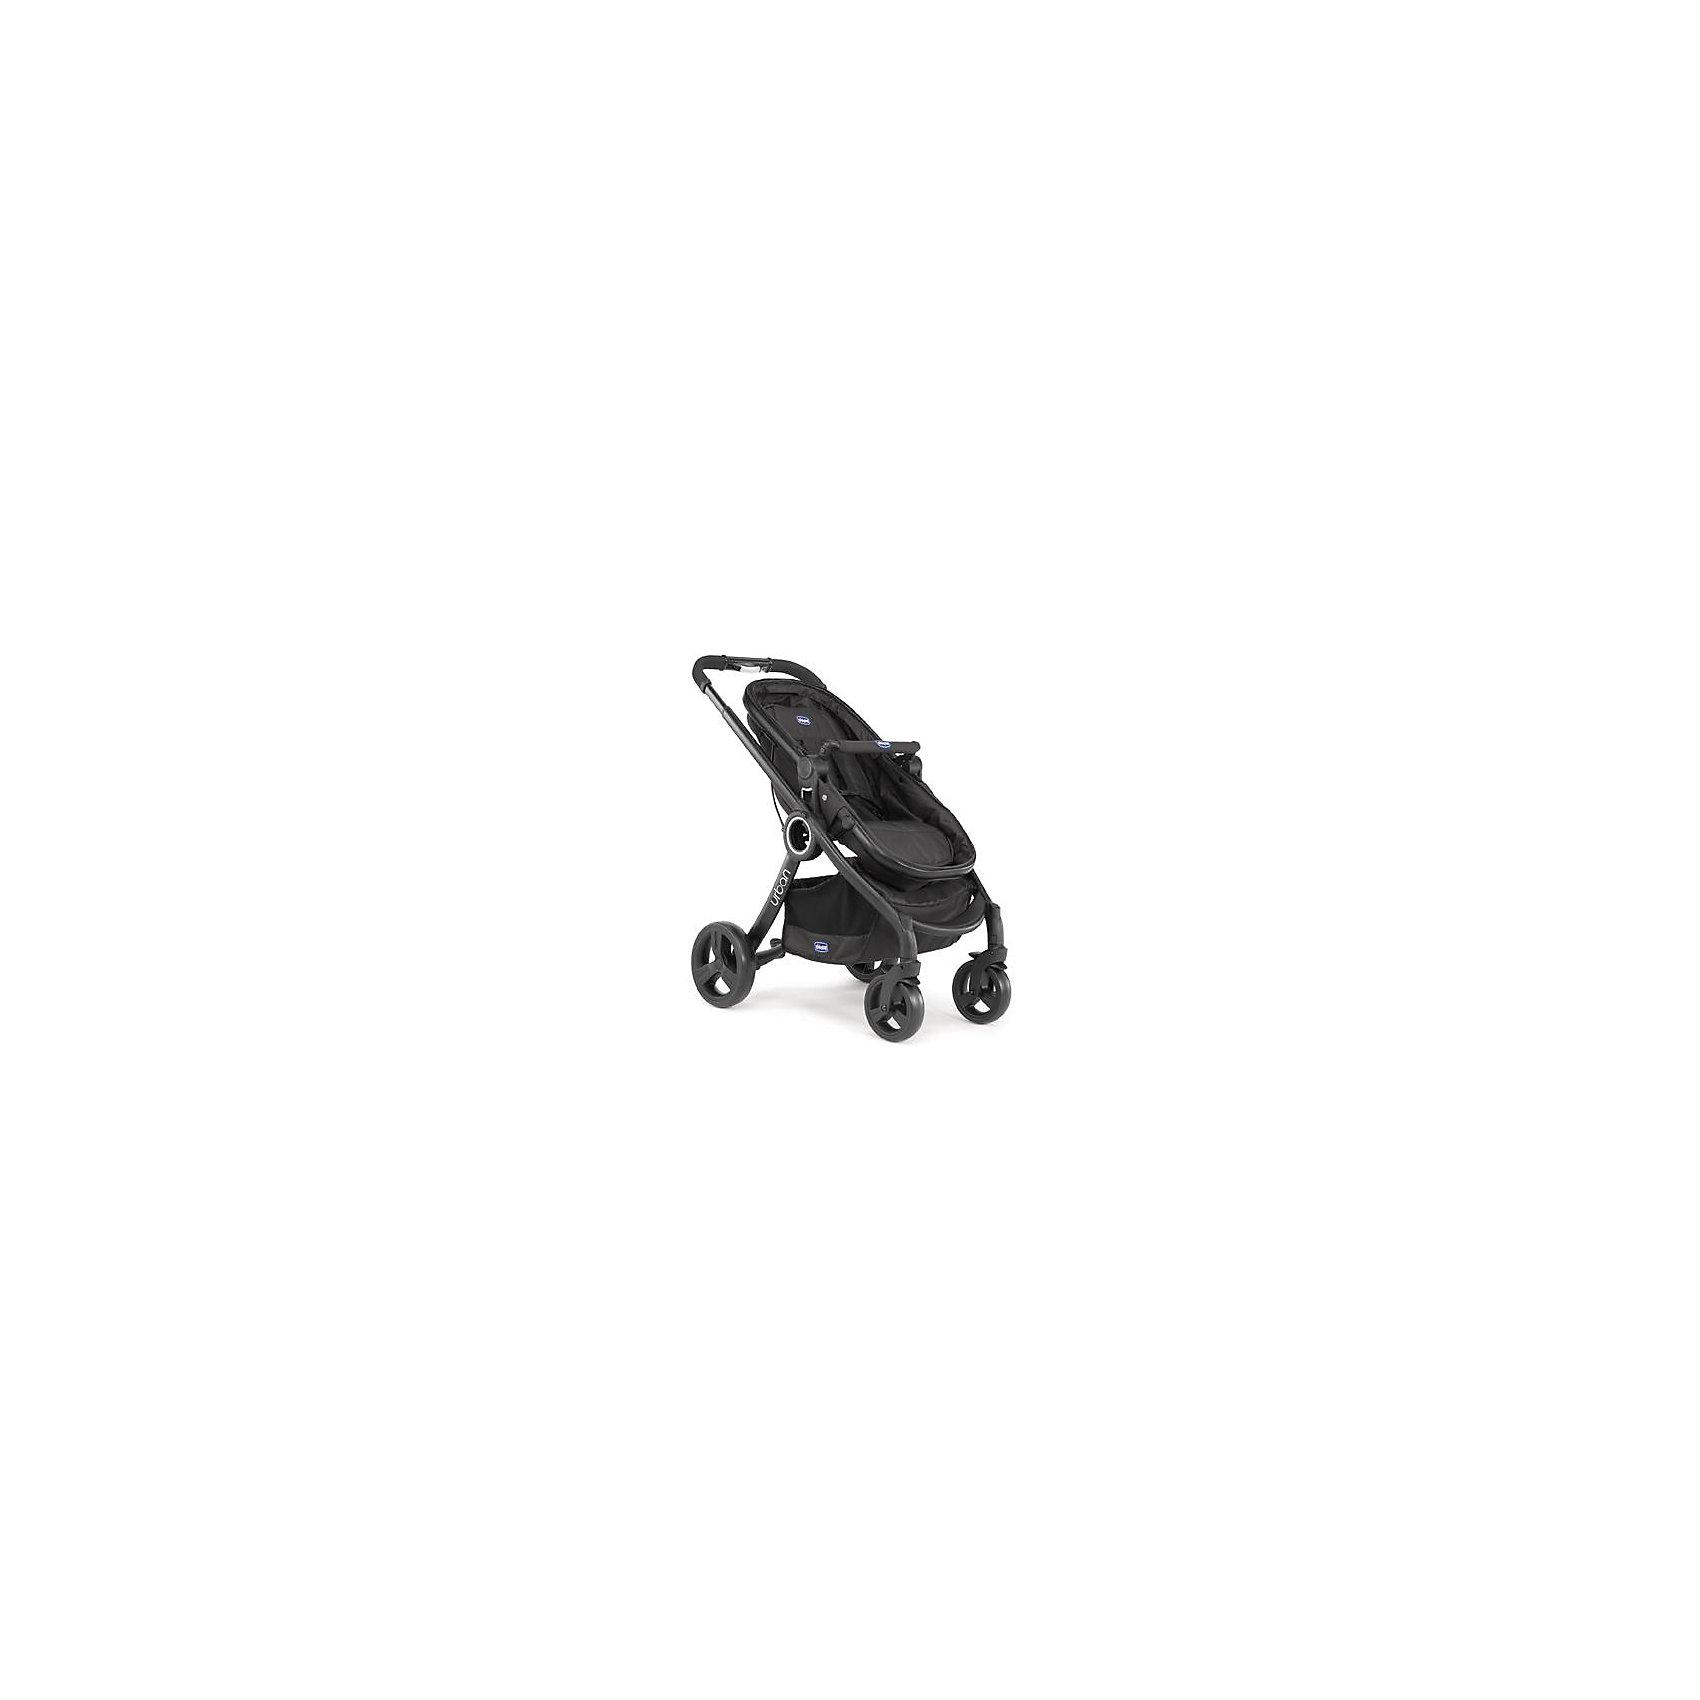 CHICCO Коляска-трансформер Urban Plus, Chicco, черный chicco color pack 06079358990000 07co1403ant набор аксессуаров для коляски urban plus anthracite